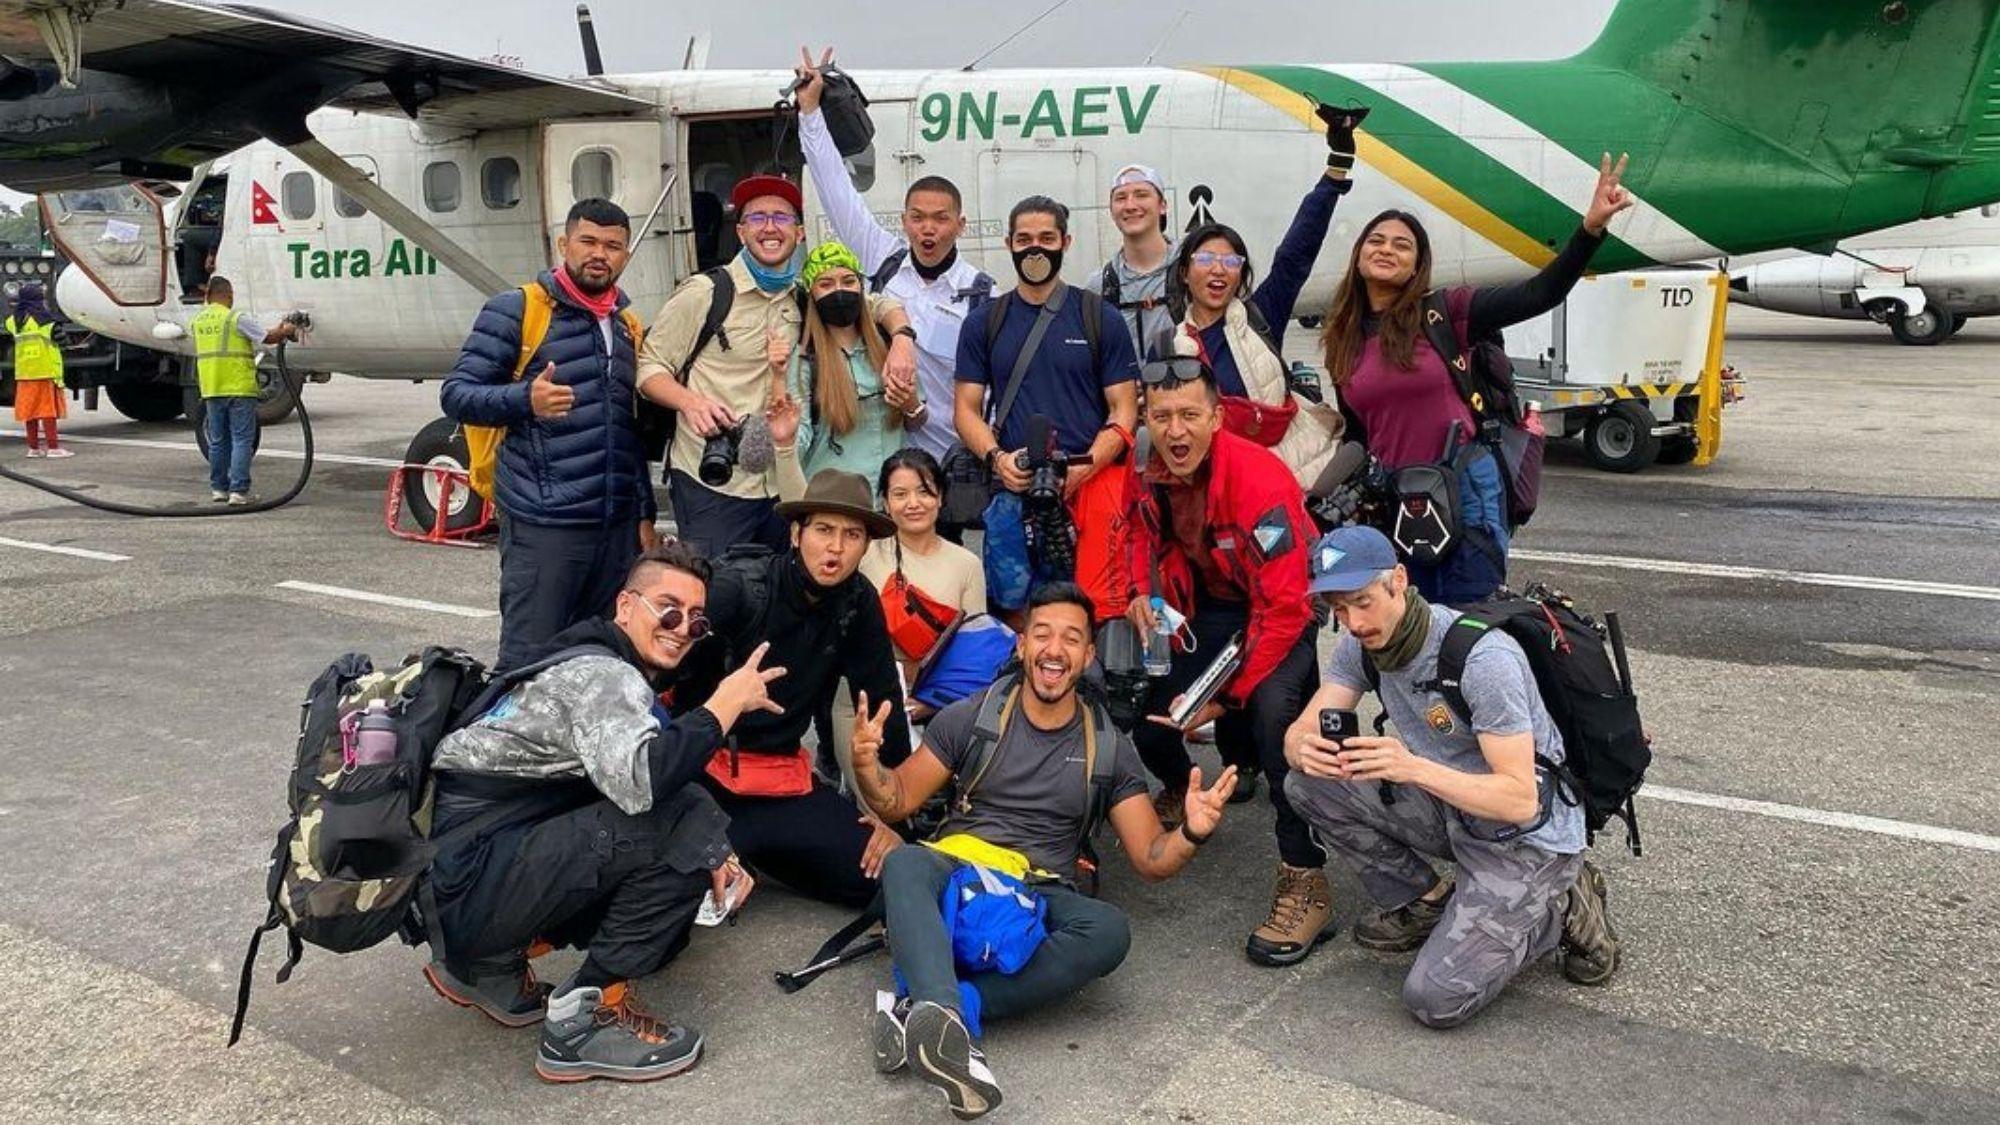 Wil Dasovich, Daniel Marsh to represent PH in vlog challenge on Mt.Everest photo@worldvlogchallenge